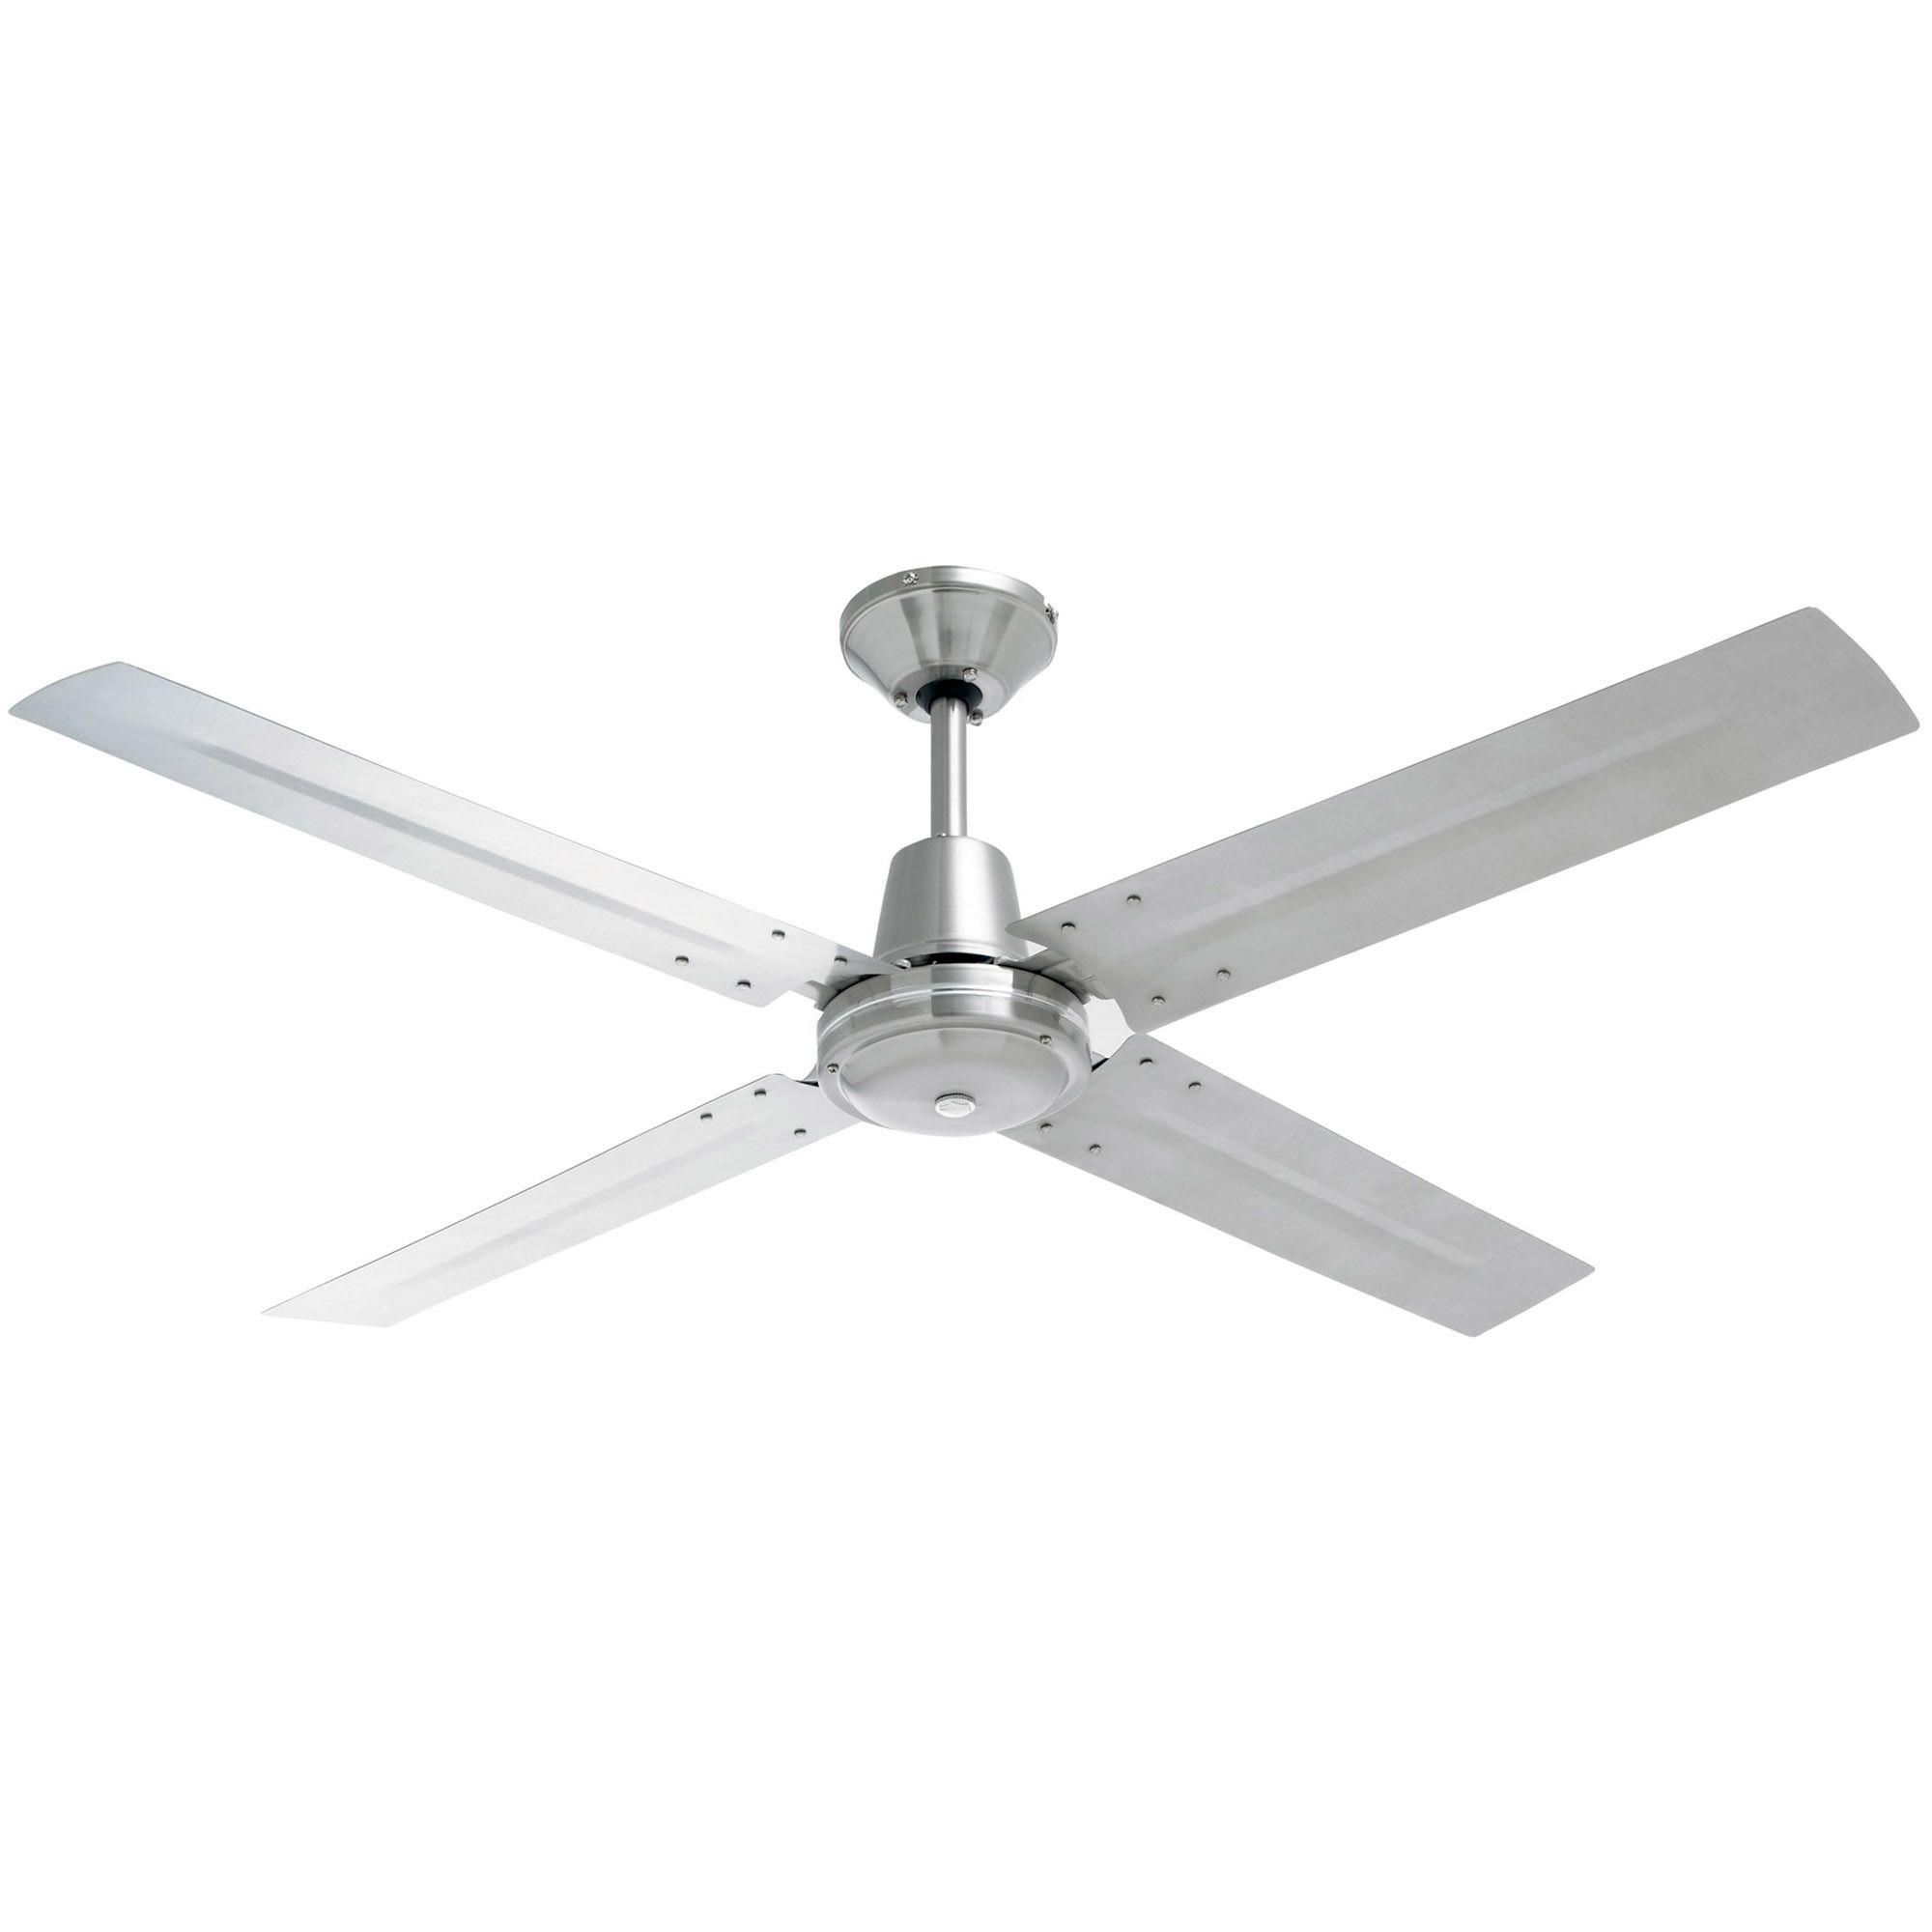 120cm Heller 4 Blade Brushed Stainless Steel Ceiling Fan In 2020 Ceiling Fan Stainless Steel Ceiling Fan Brushed Stainless Steel